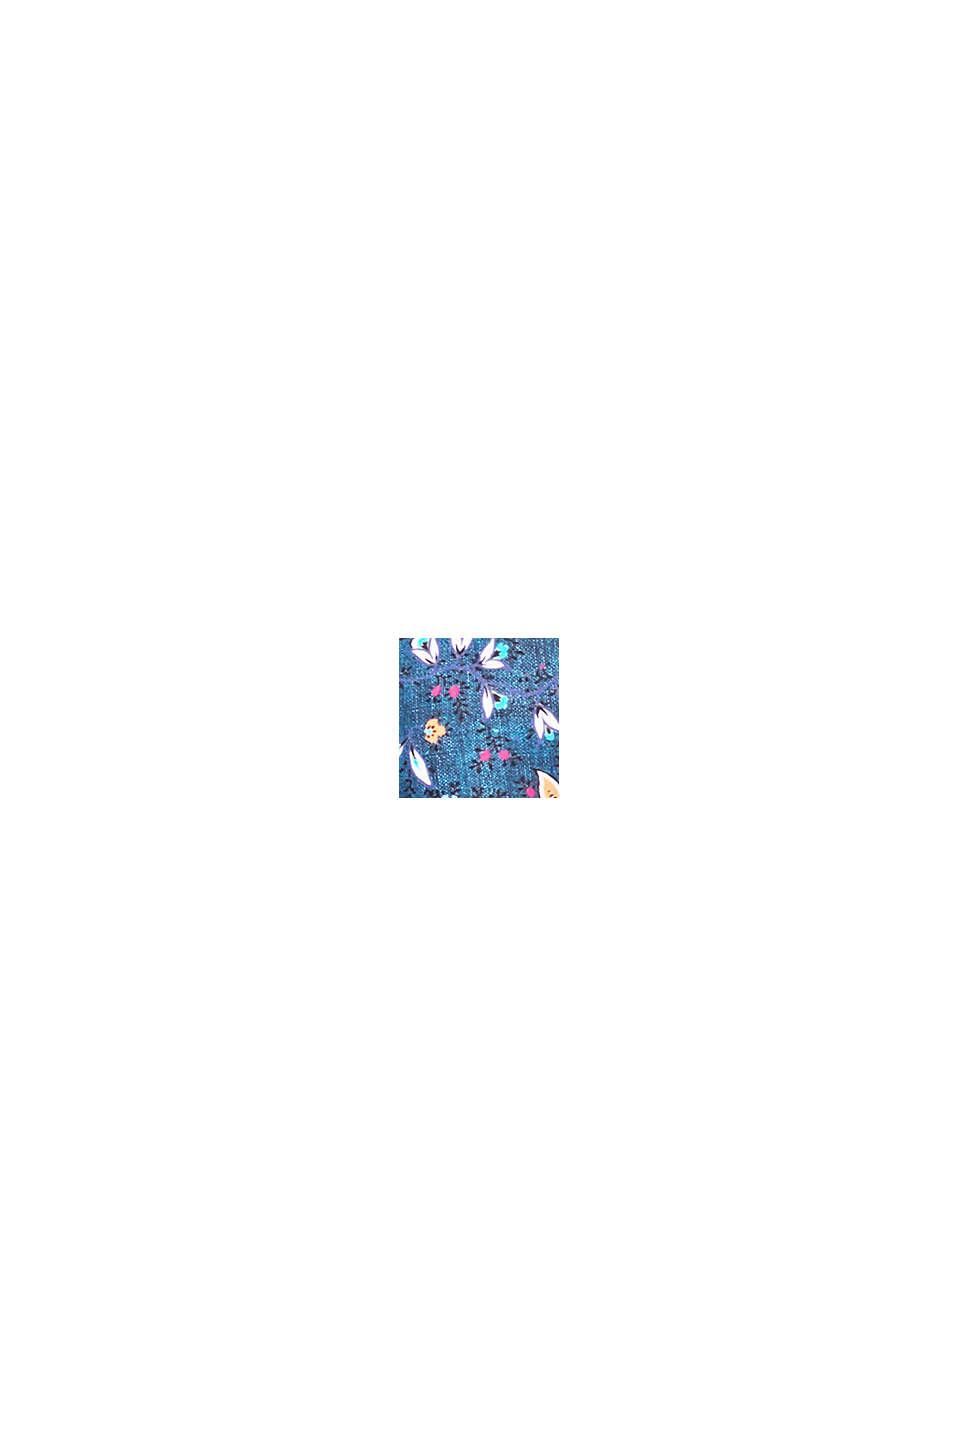 Ovadderad bygelöverdel med rysch, GREY BLUE, swatch